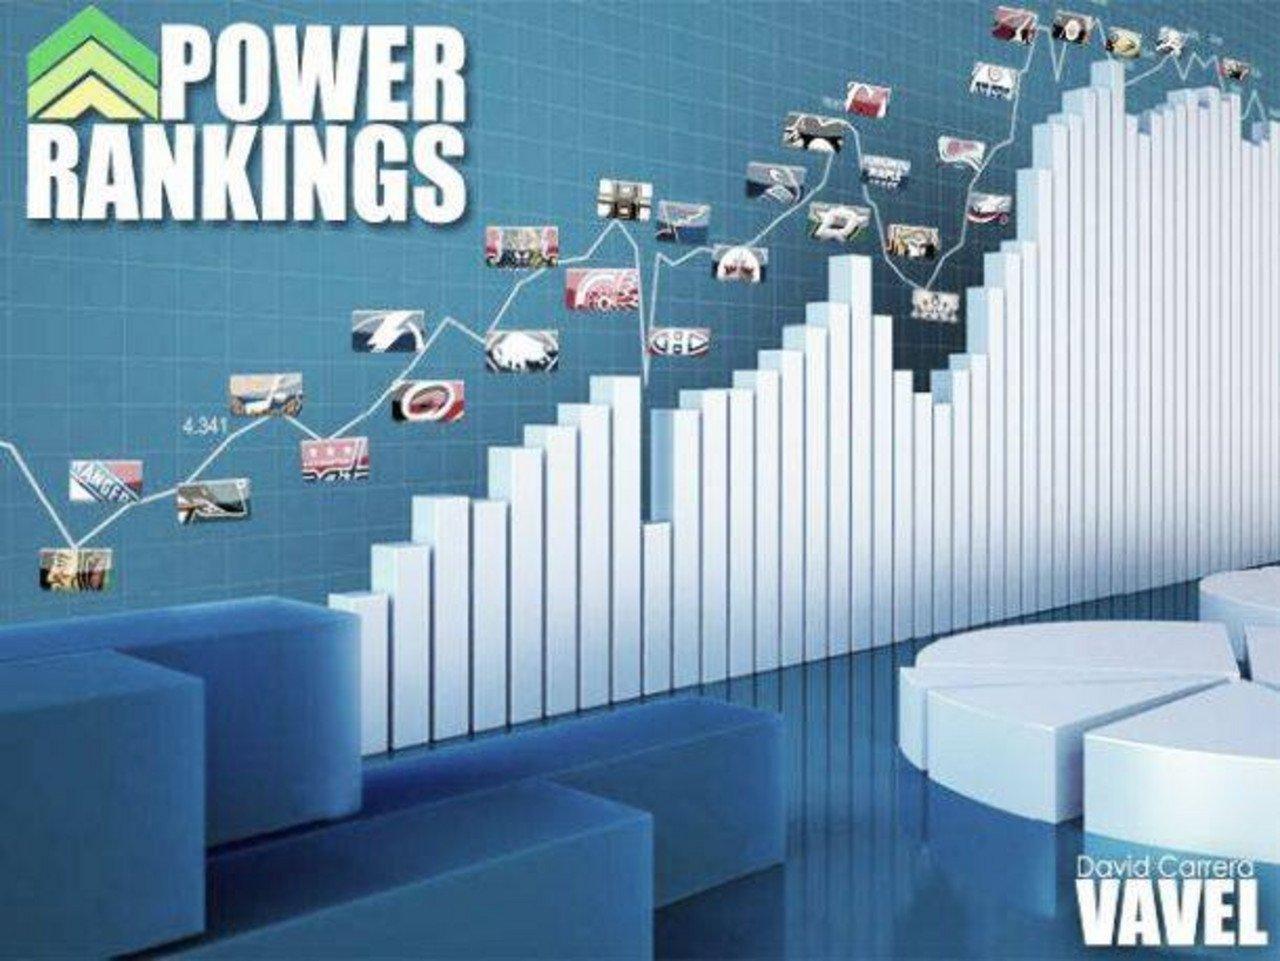 NHL Power Rankings 2018/19: semana 11